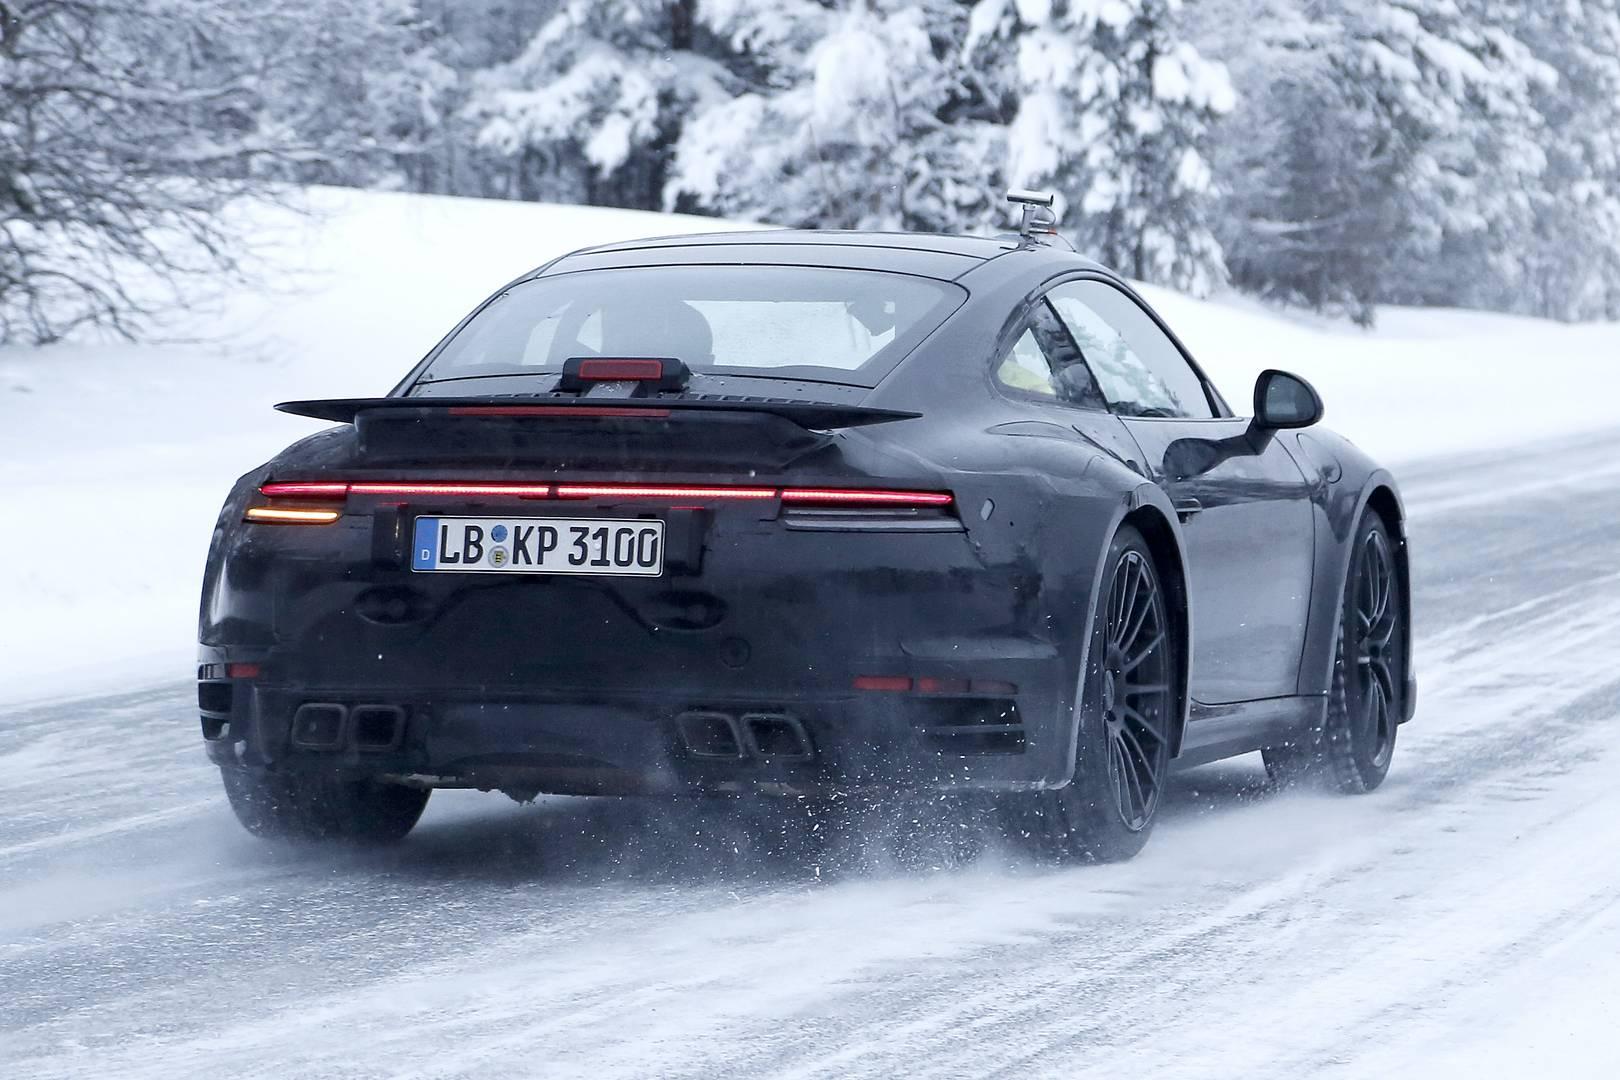 2020 Porsche 911 Turbo Spy Shots - Type 992 Gen